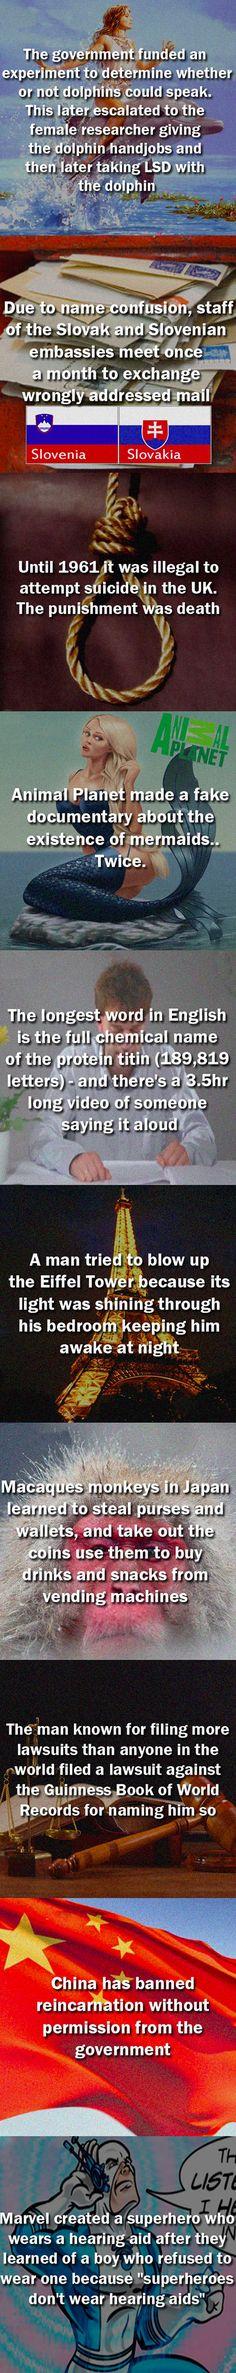 Ten random and interesting facts.